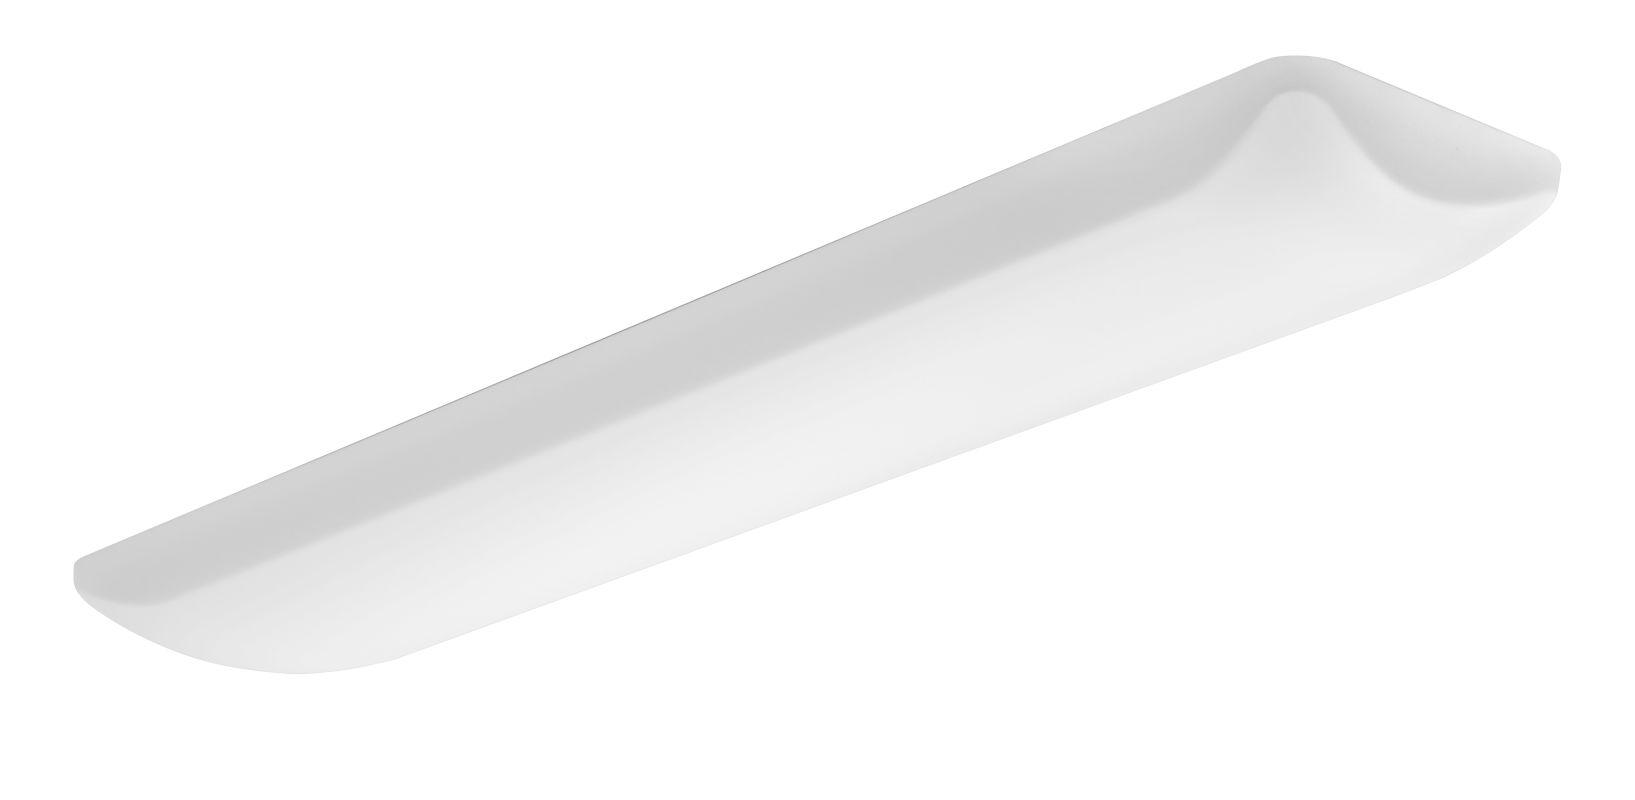 "Lithonia Lighting FMLL 9 30840 LitePuff "" Flush Mount 4000K LED"